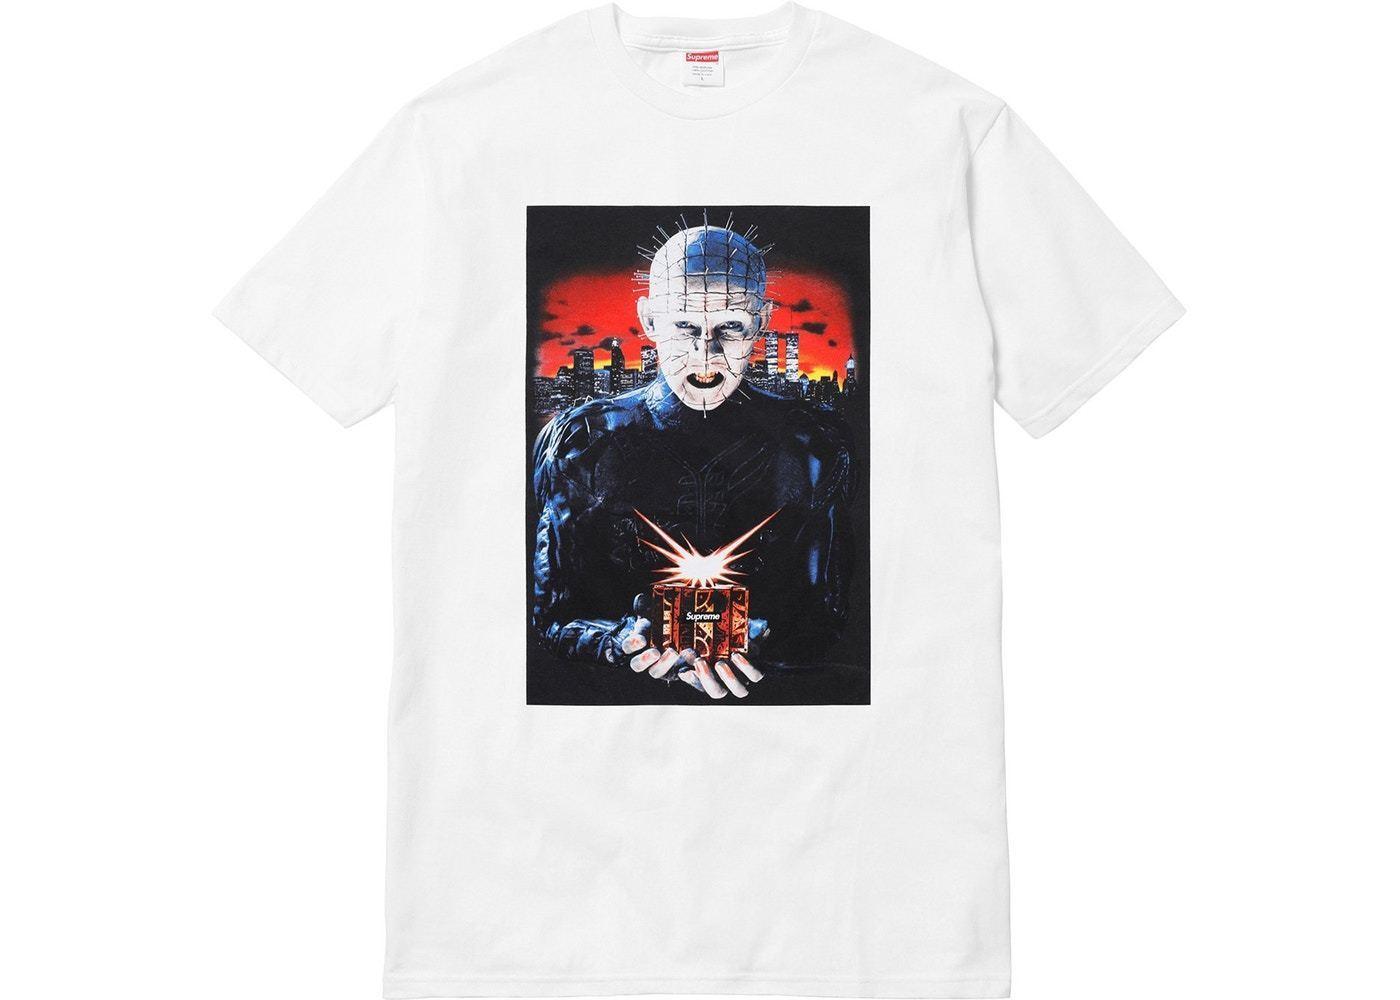 9ea5dd5df Men O Neck High Quality Hot Sell Hellraiser Hell On Earth Tee T Shirt White  Size Medium T Shirt Online T Shirt Designer From Onecktshirt, $15.72|  DHgate.Com